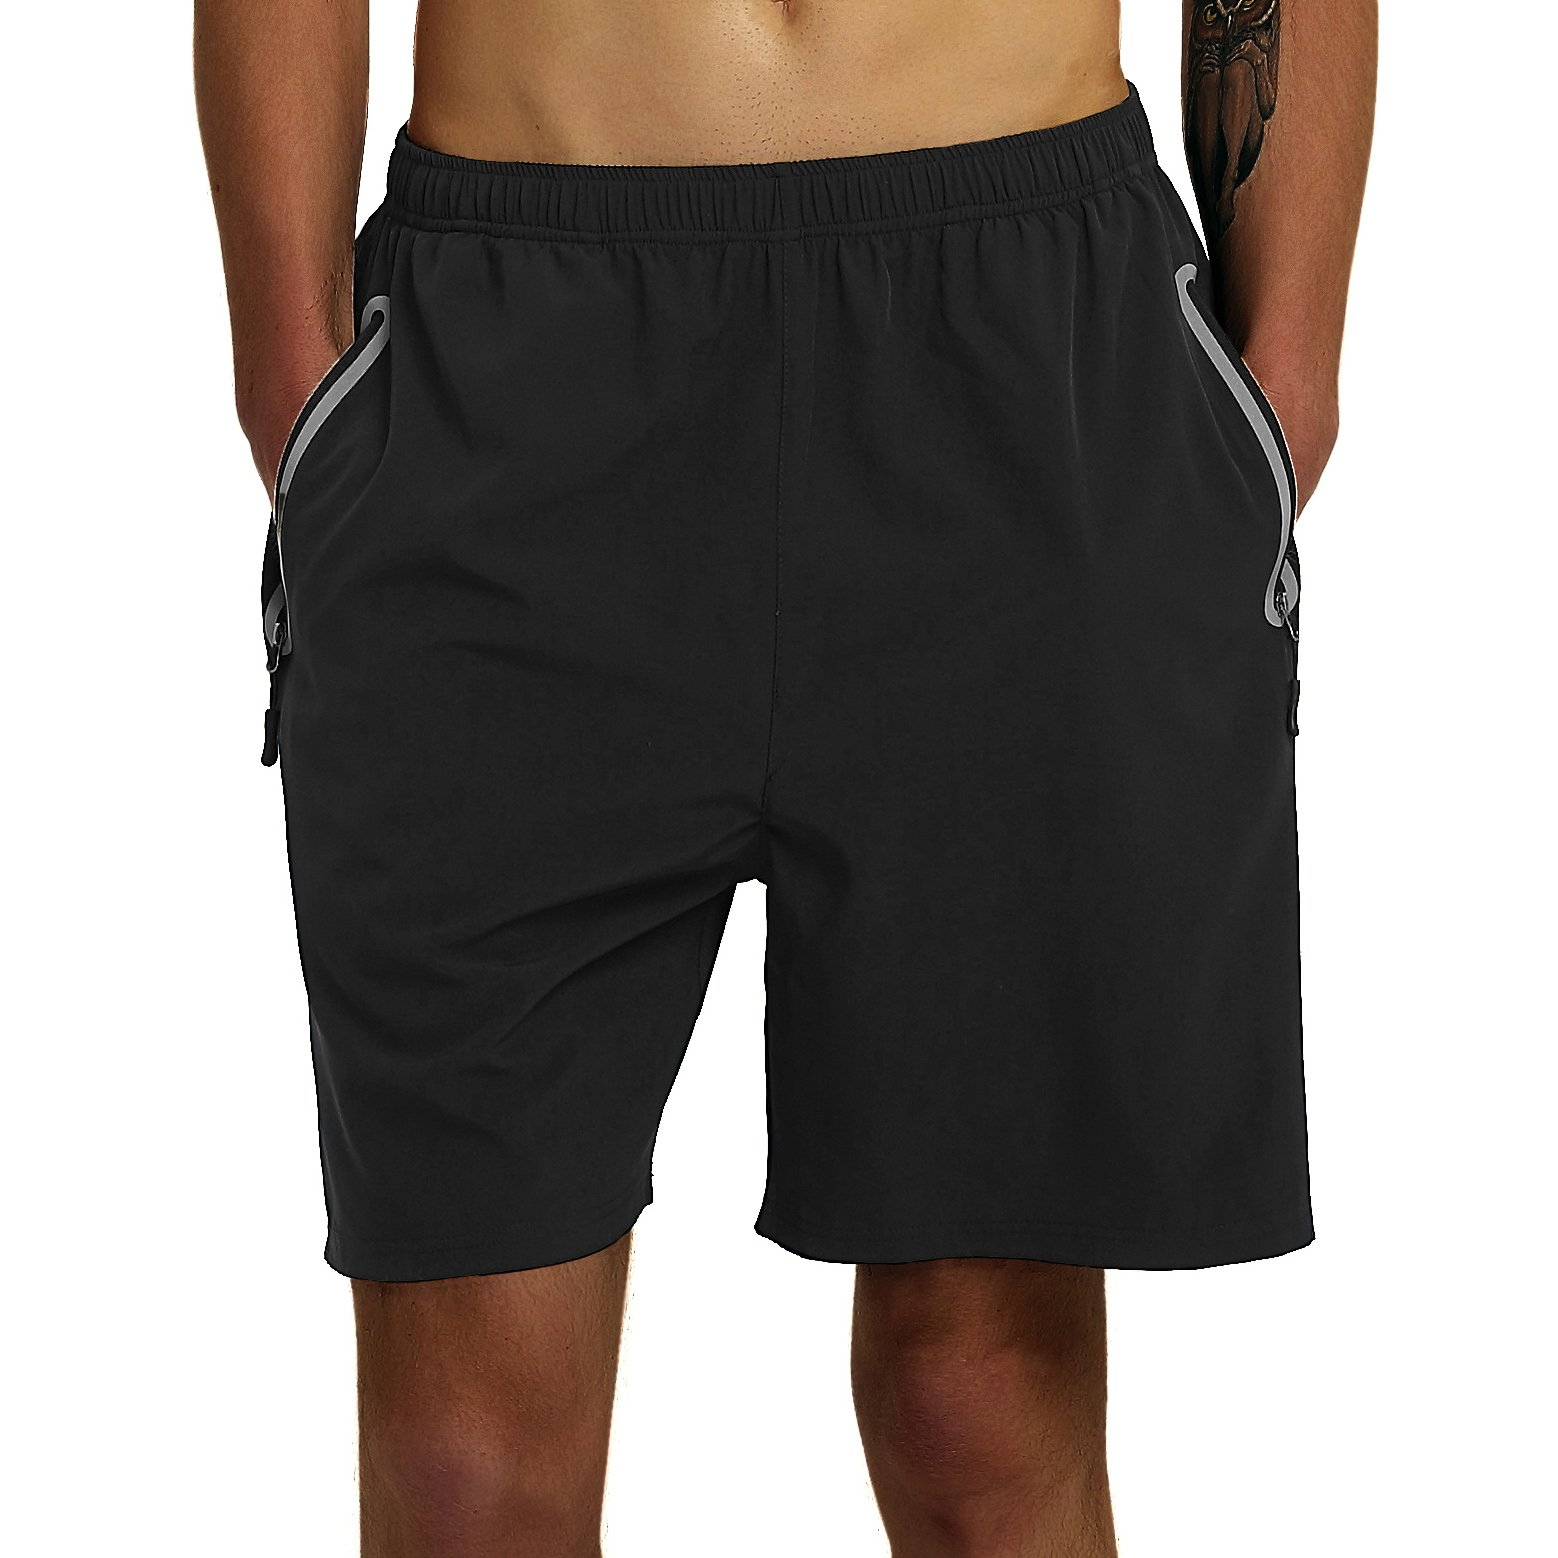 SuperArt Men\'s Gym Shorts Outdoor Sports Running Beach Shorts Lightweight Quick Dry Shorts Reflective with Zipper Pockets (Black, Medium)